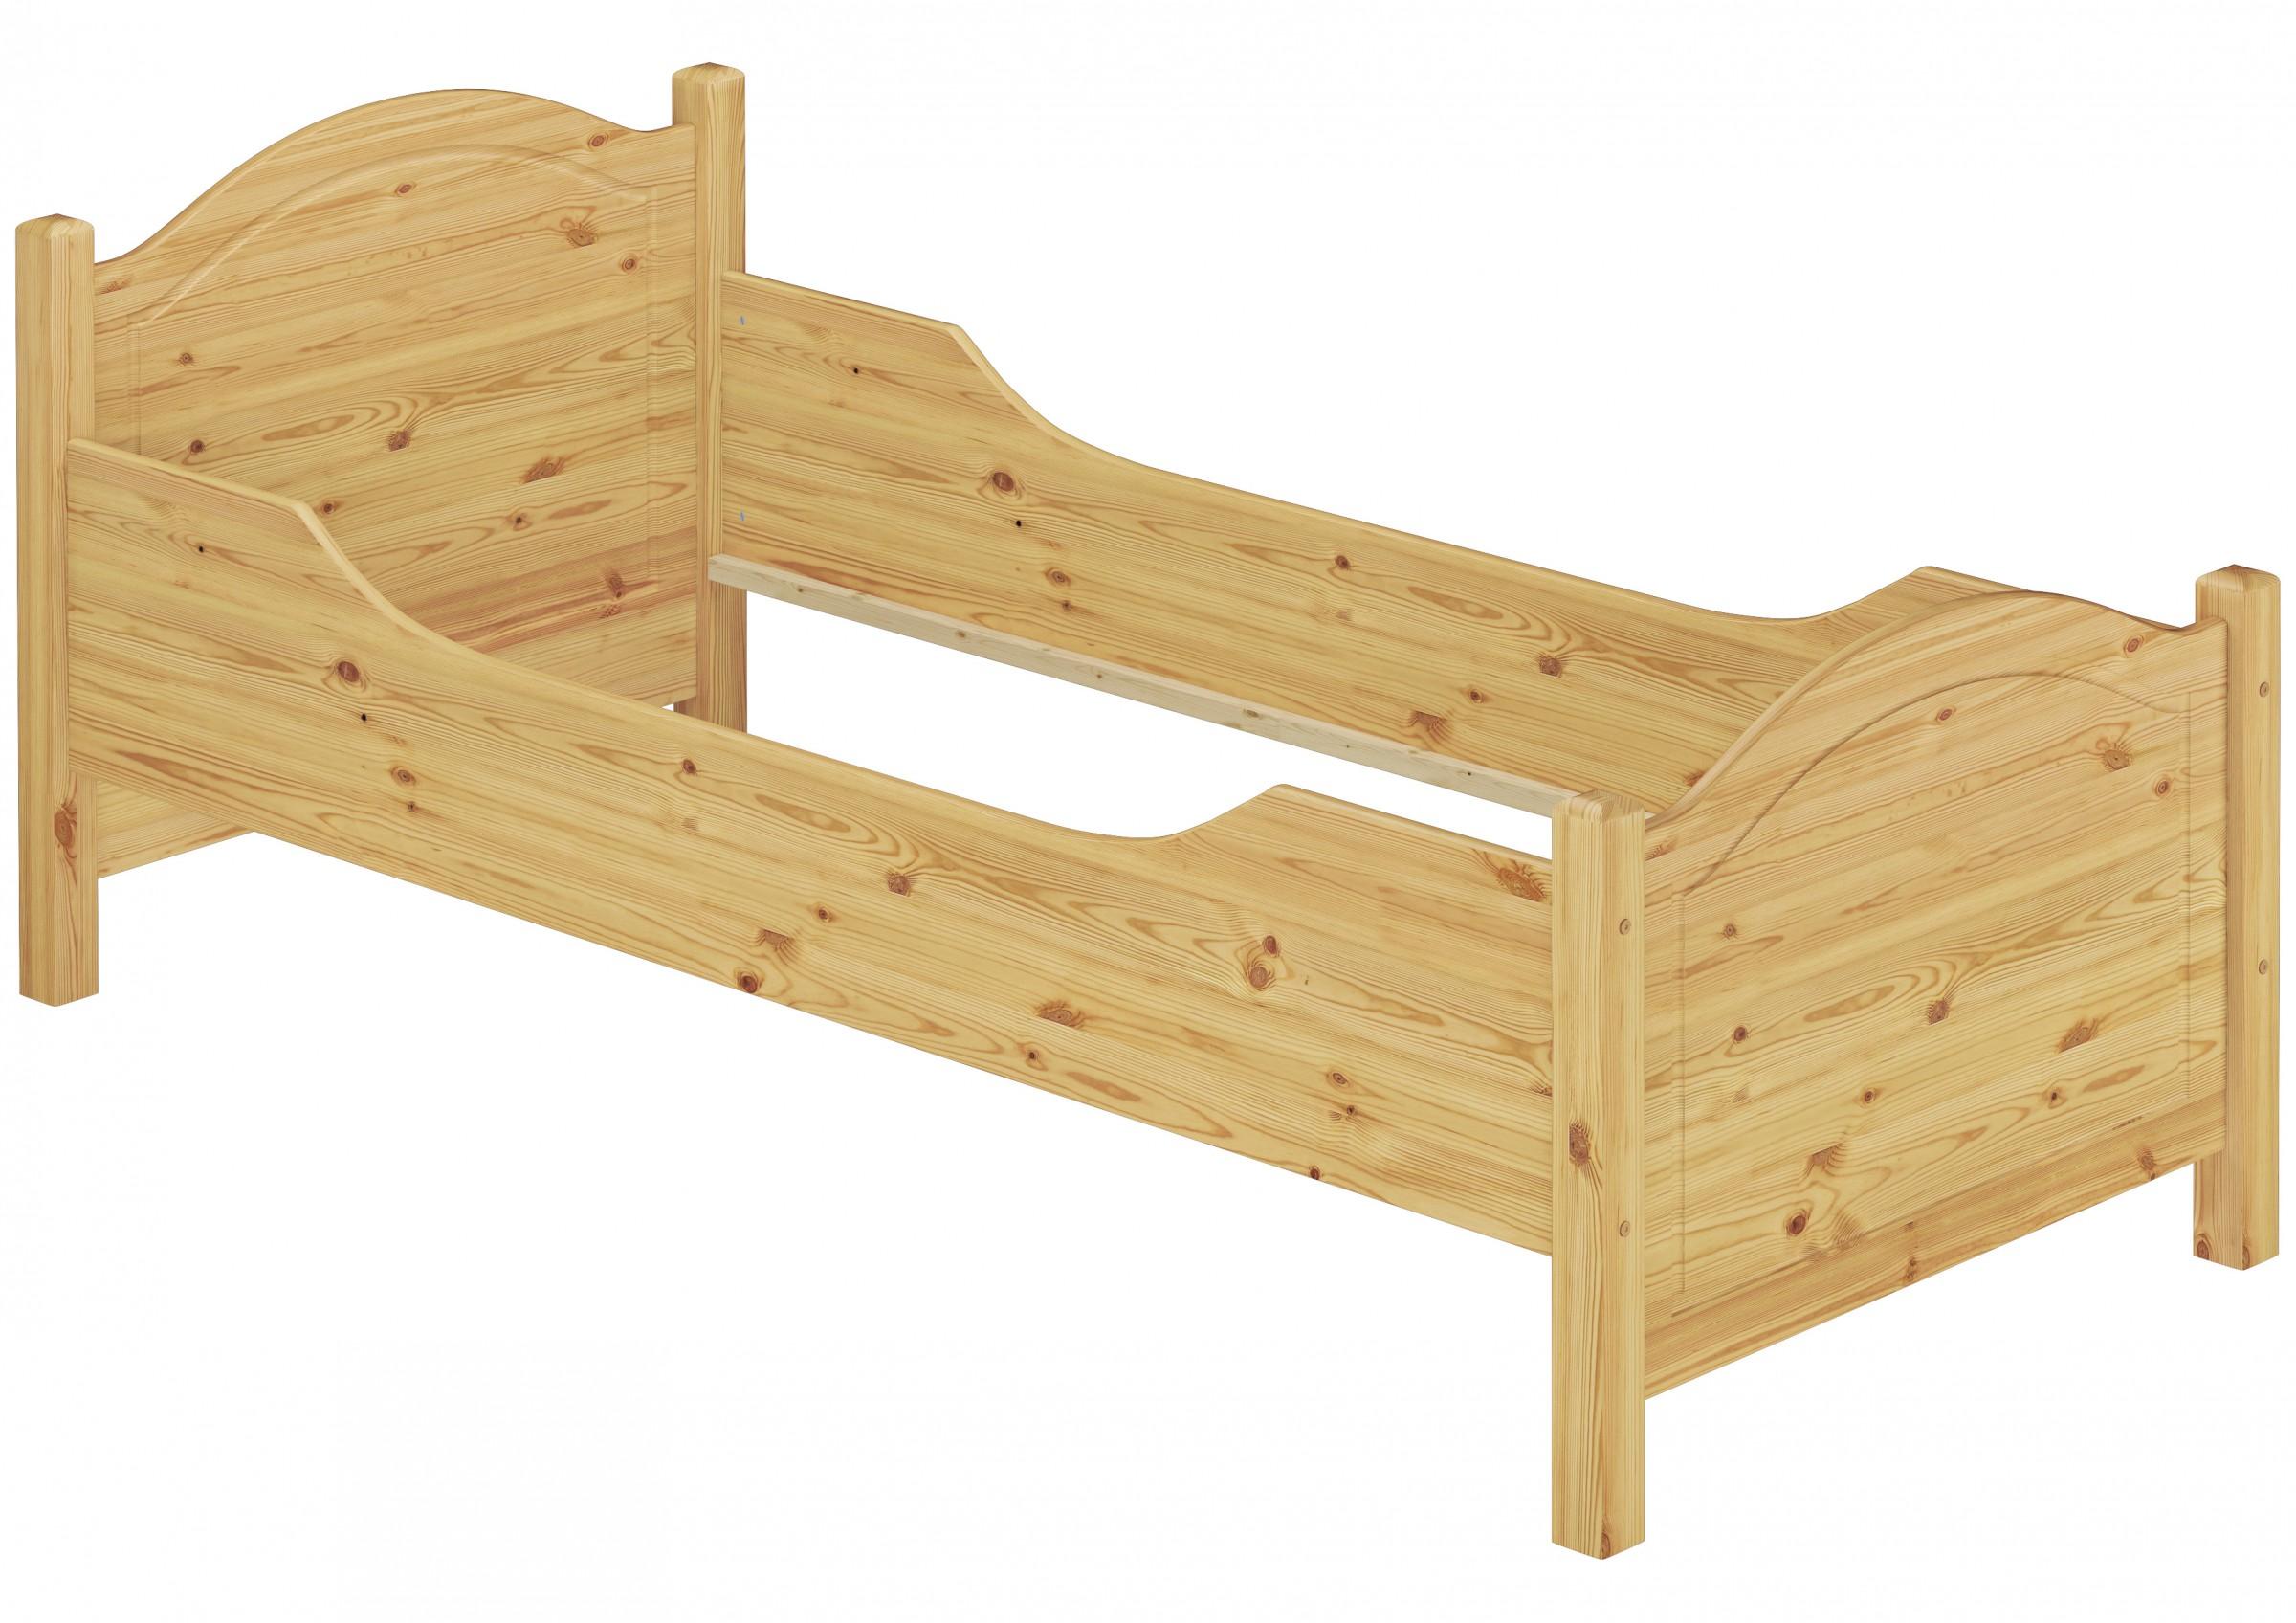 seniorenbett extra hoch 100x220 berl nge massivholz holzbett einzelbett g stebett. Black Bedroom Furniture Sets. Home Design Ideas